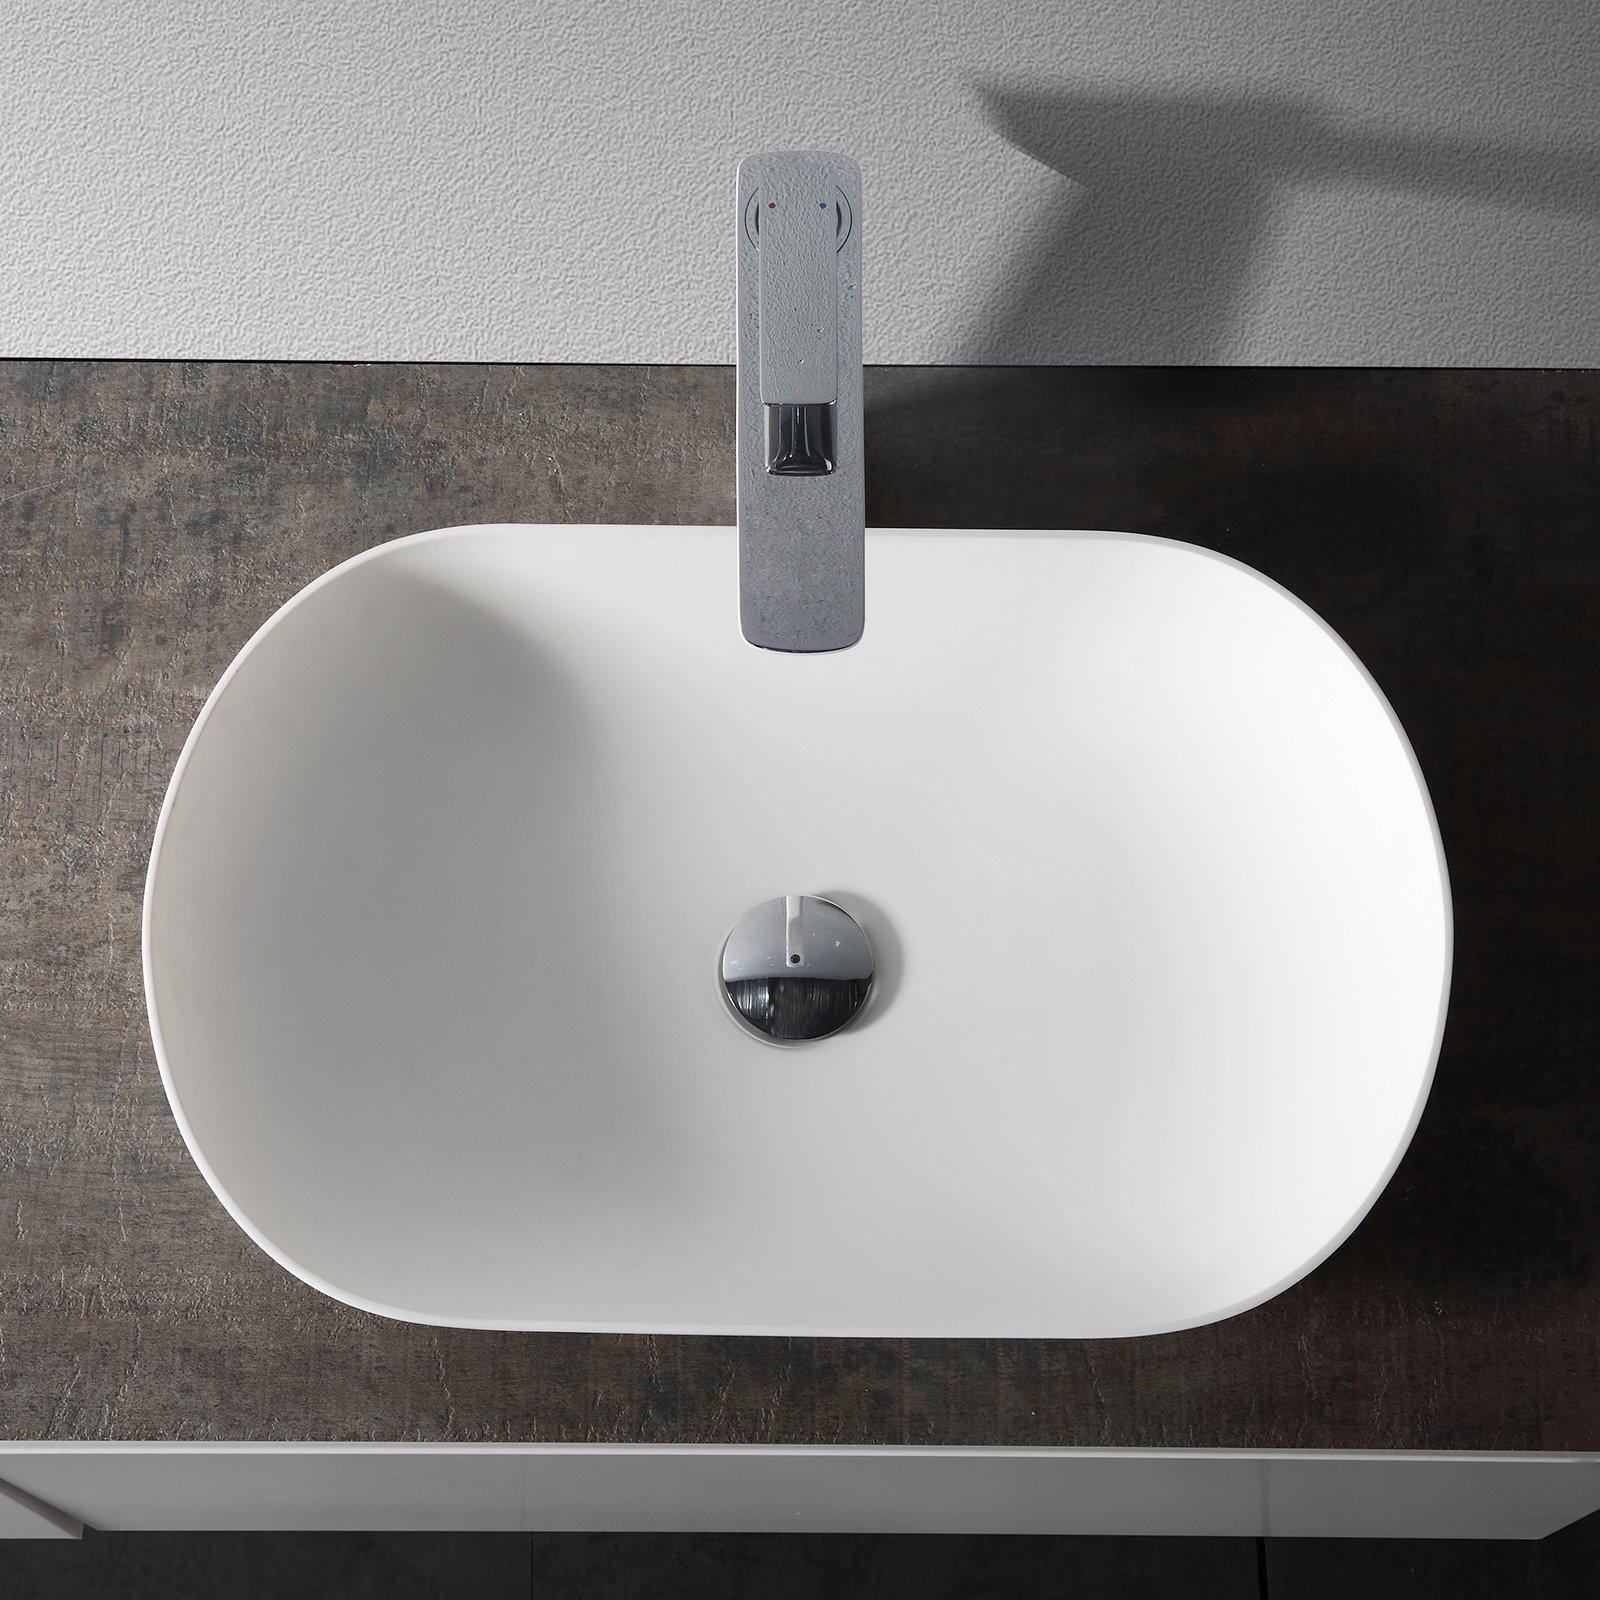 Aufsatzwaschbecken O-540 aus Mineralguss - Weiß matt - 54 x 34 x 10,5 cm zoom thumbnail 5